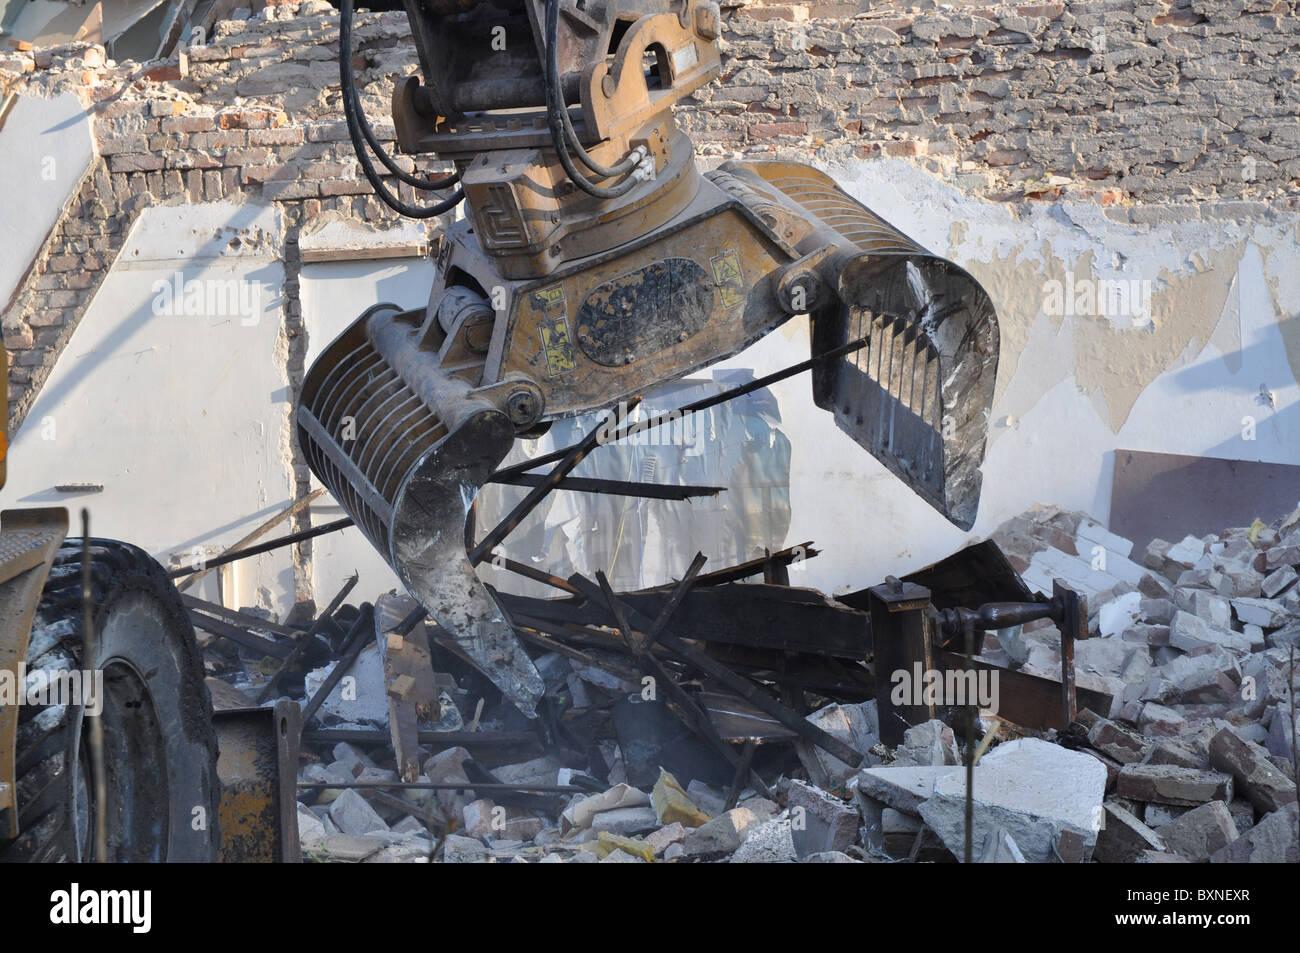 Demolition machine in action - Stock Image